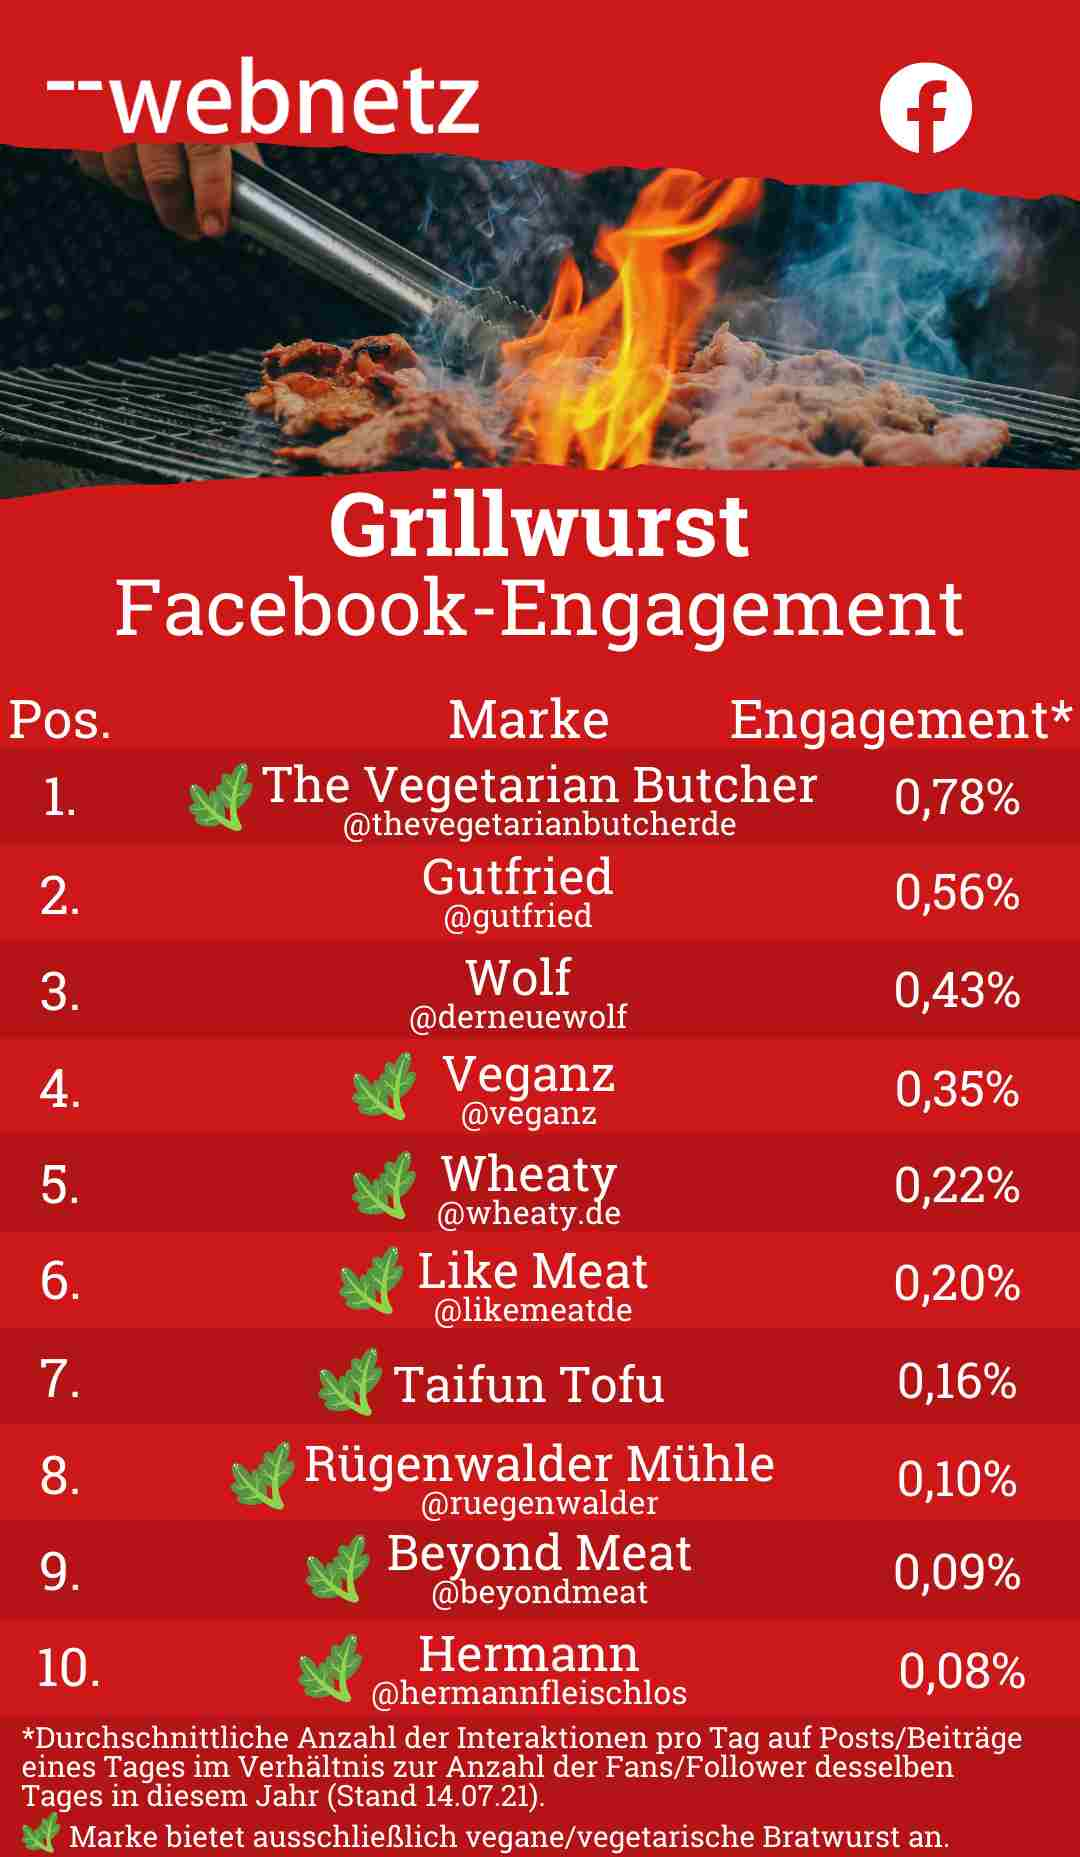 Grillwurst Facebook-Engagement